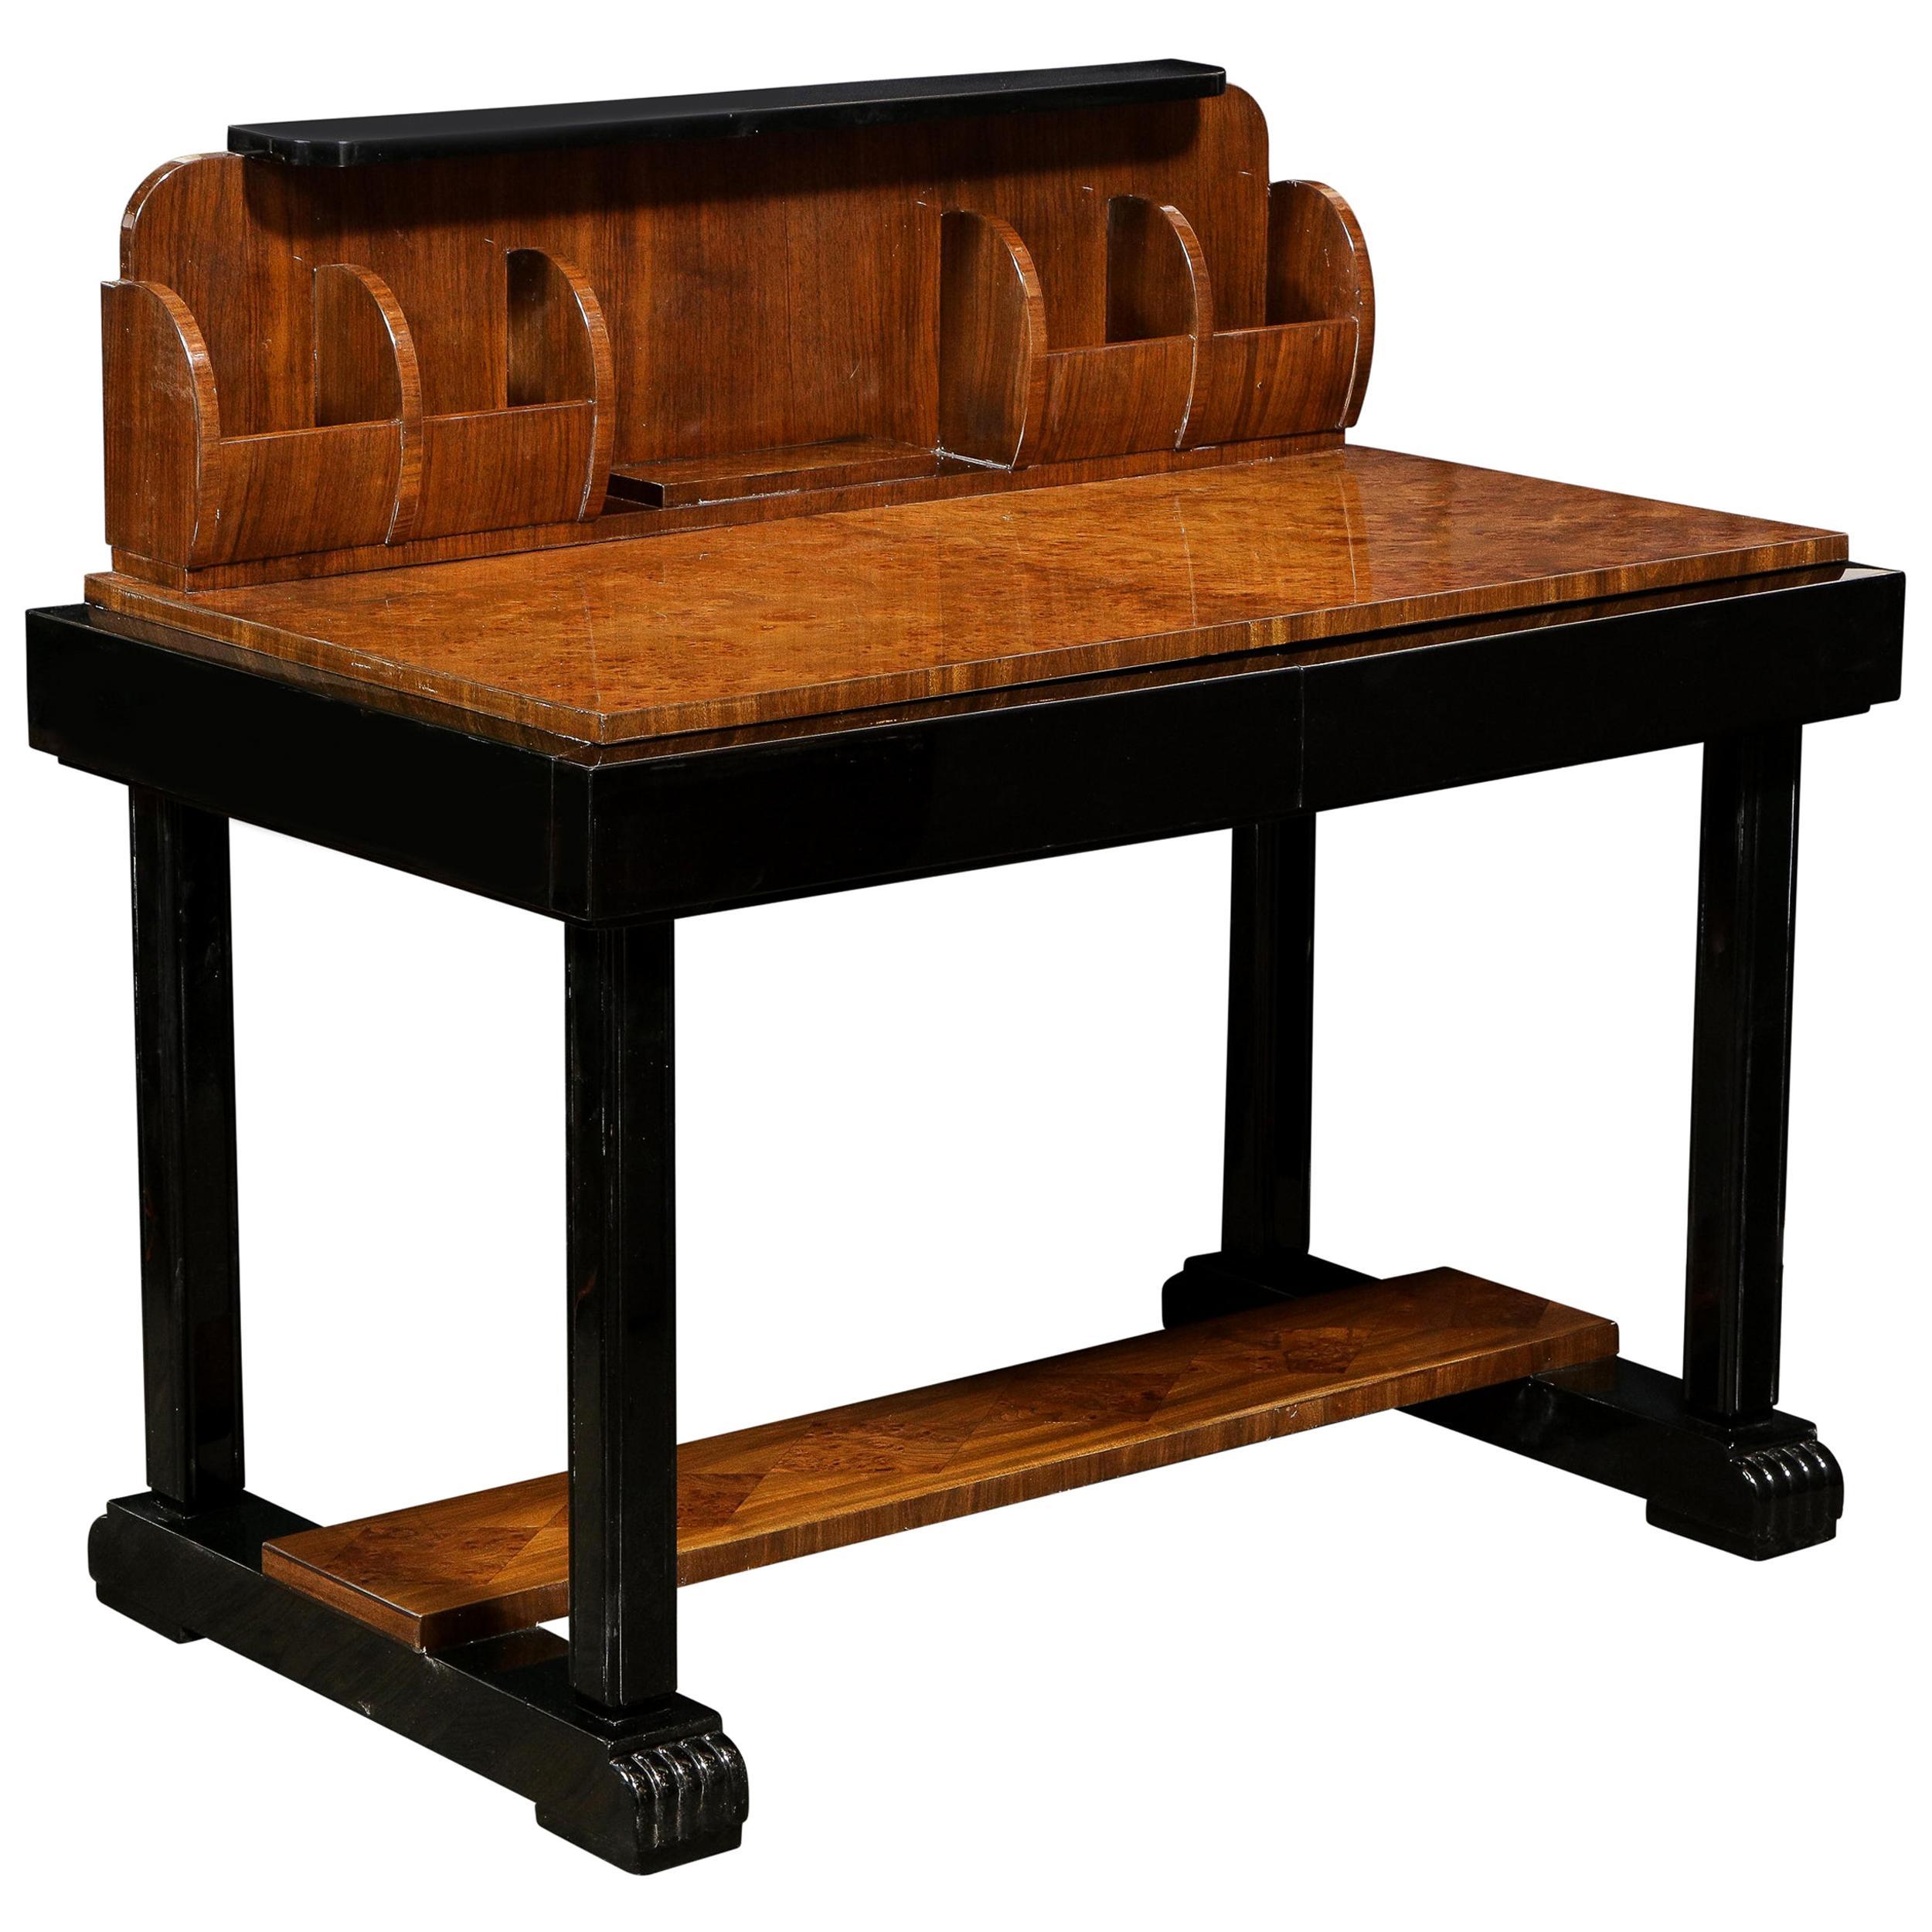 Art Deco Streamlined Burled & Bookmatched Carpathian Elm, Walnut & Lacquer Desk